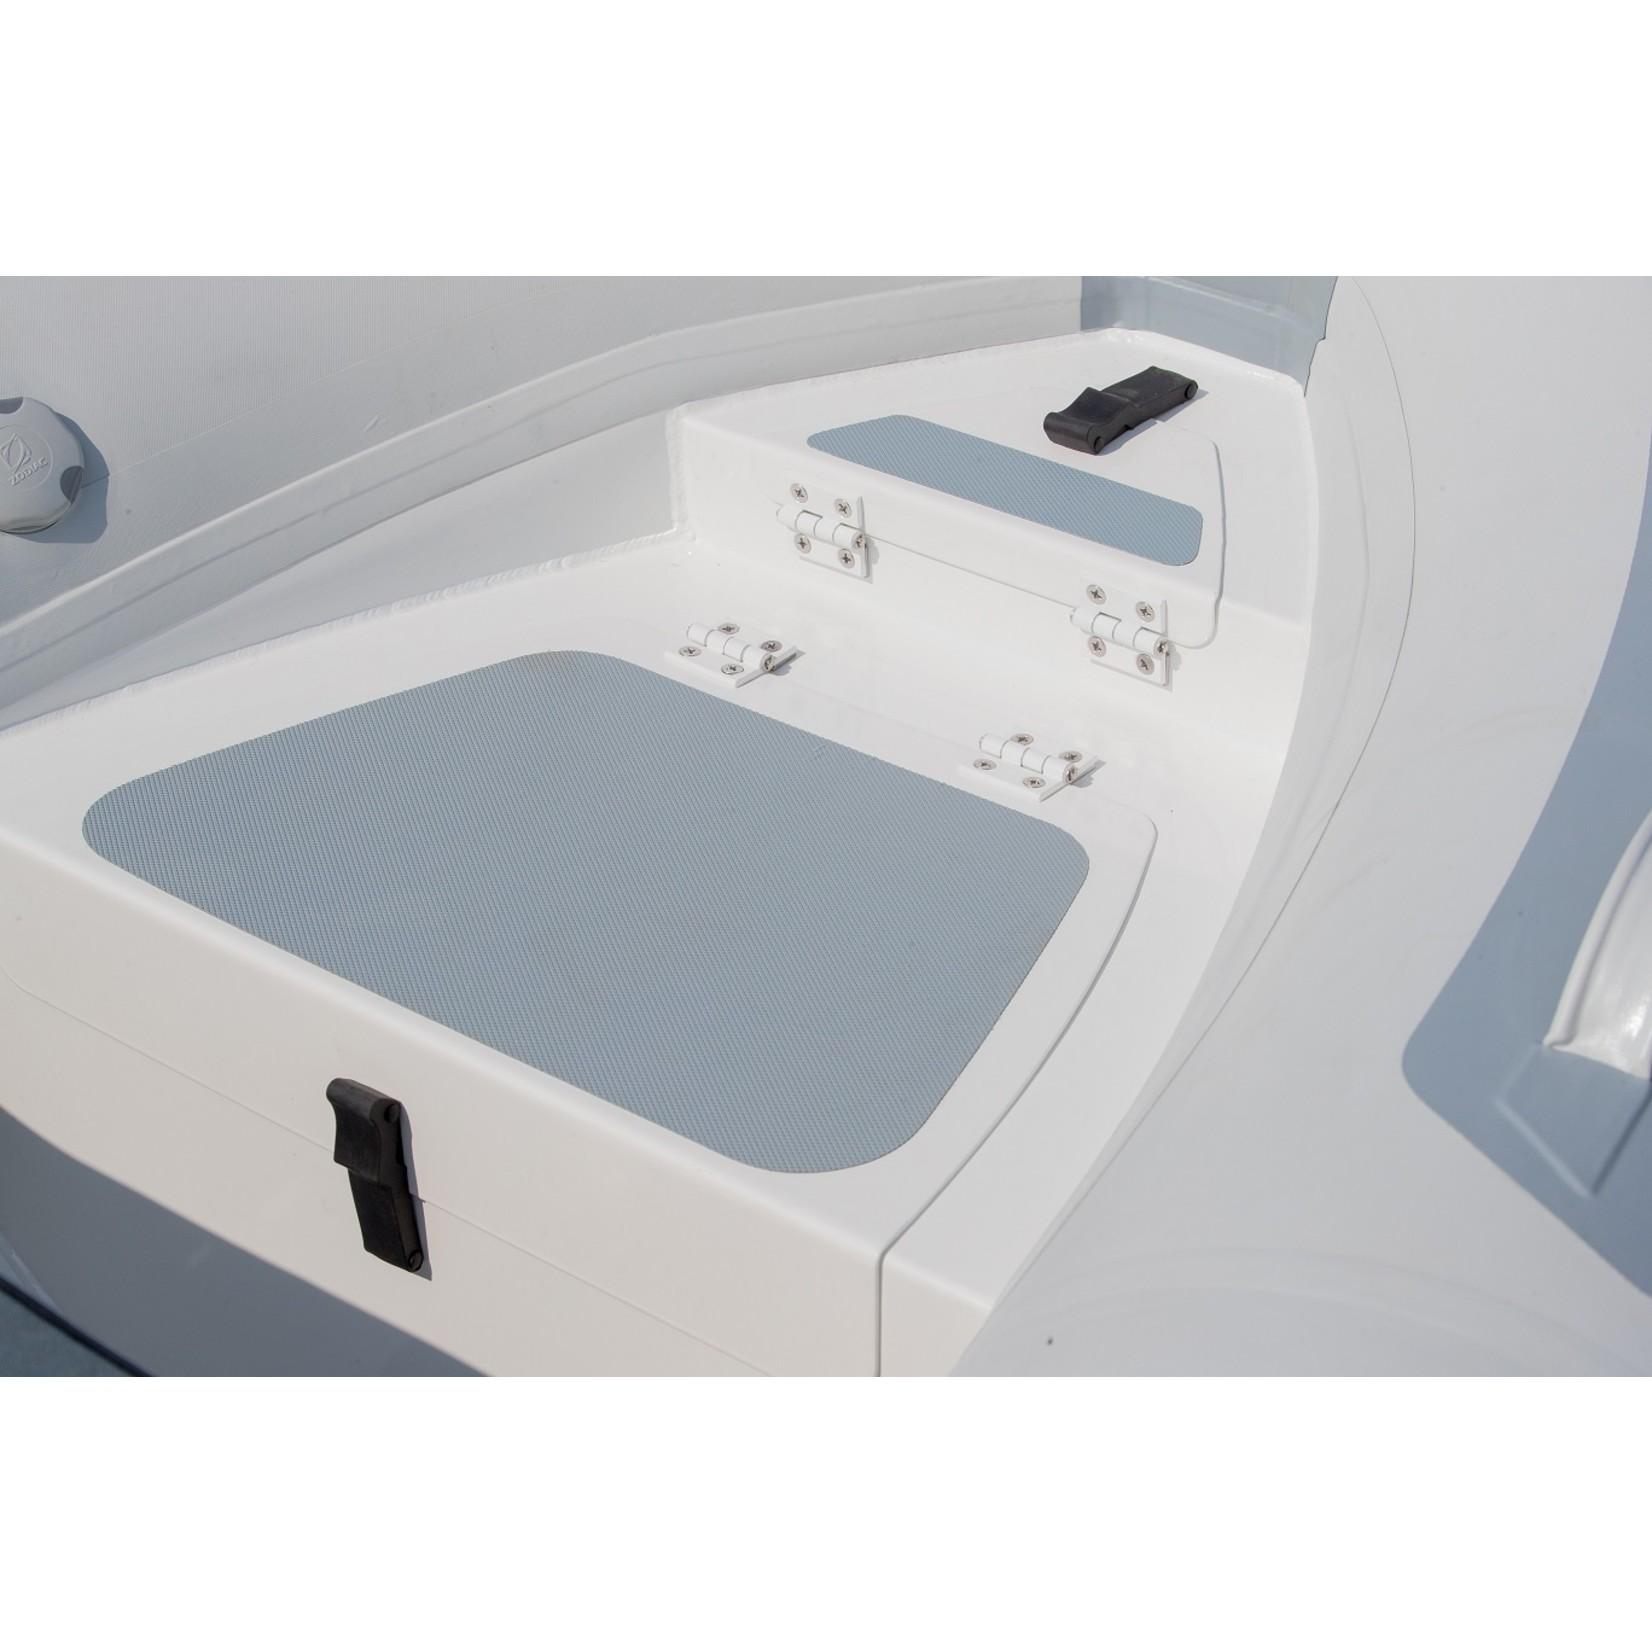 Zodiac Cadet 360 DL ALU RIB - Deck & Locker